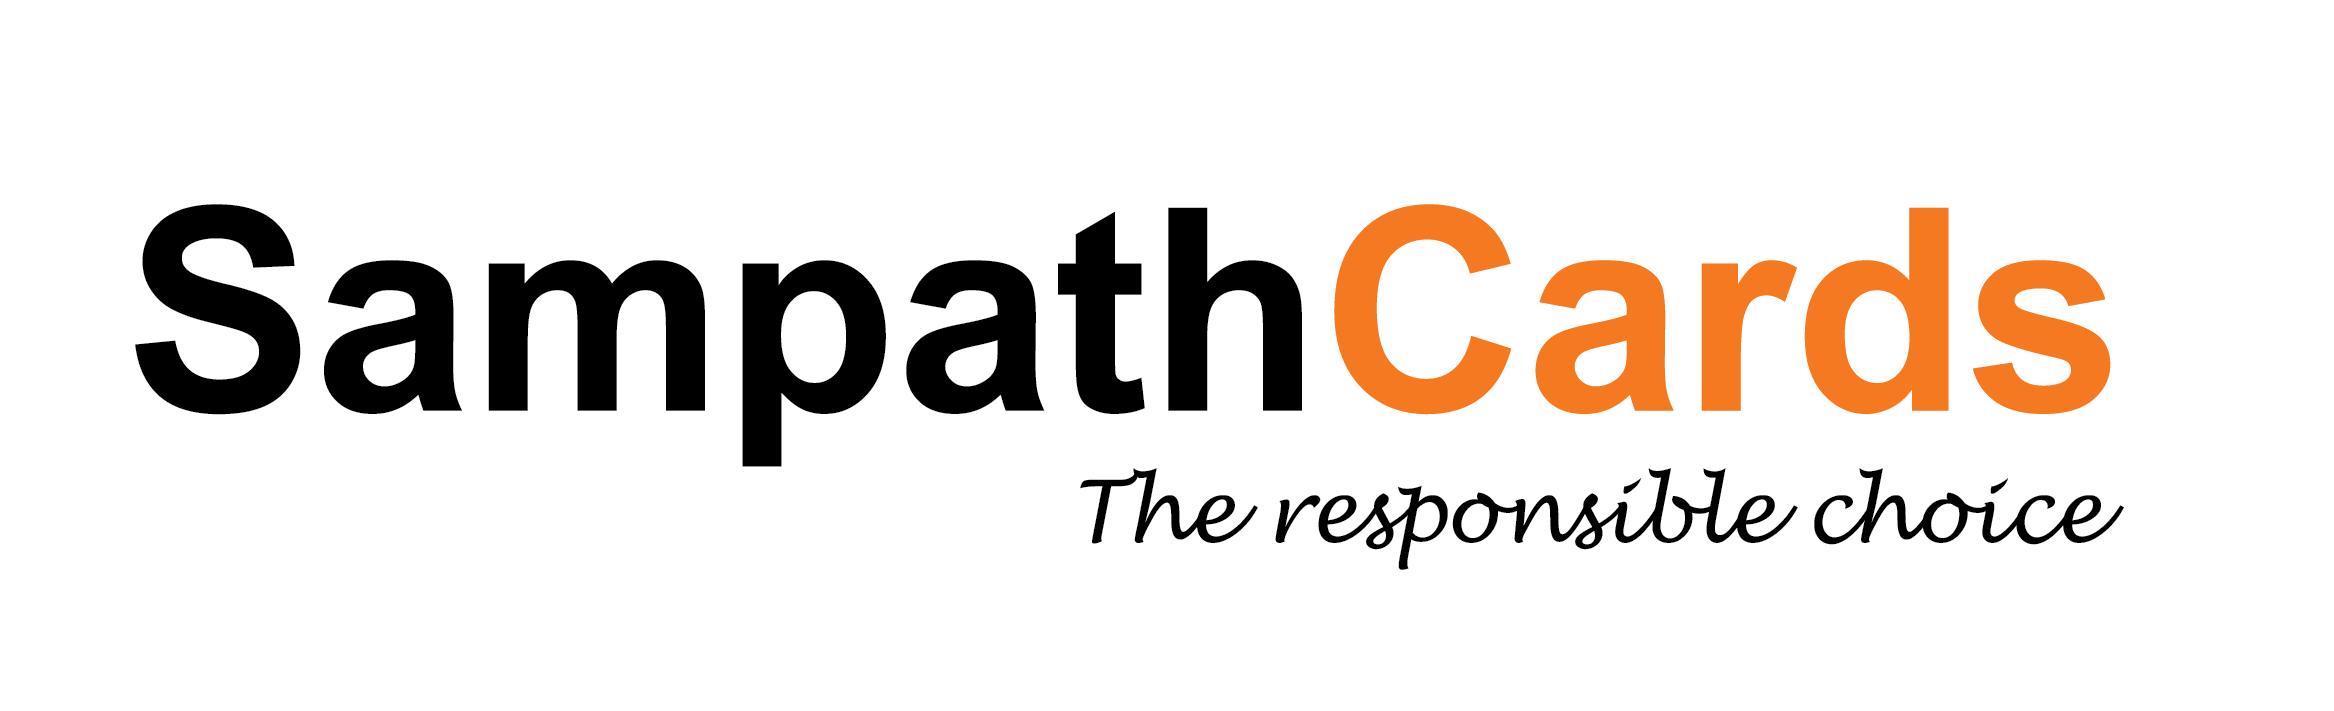 https://assets.roar.media/assets/skKPfFv0pfrdaoyT_Sampath-Card-Logo.png